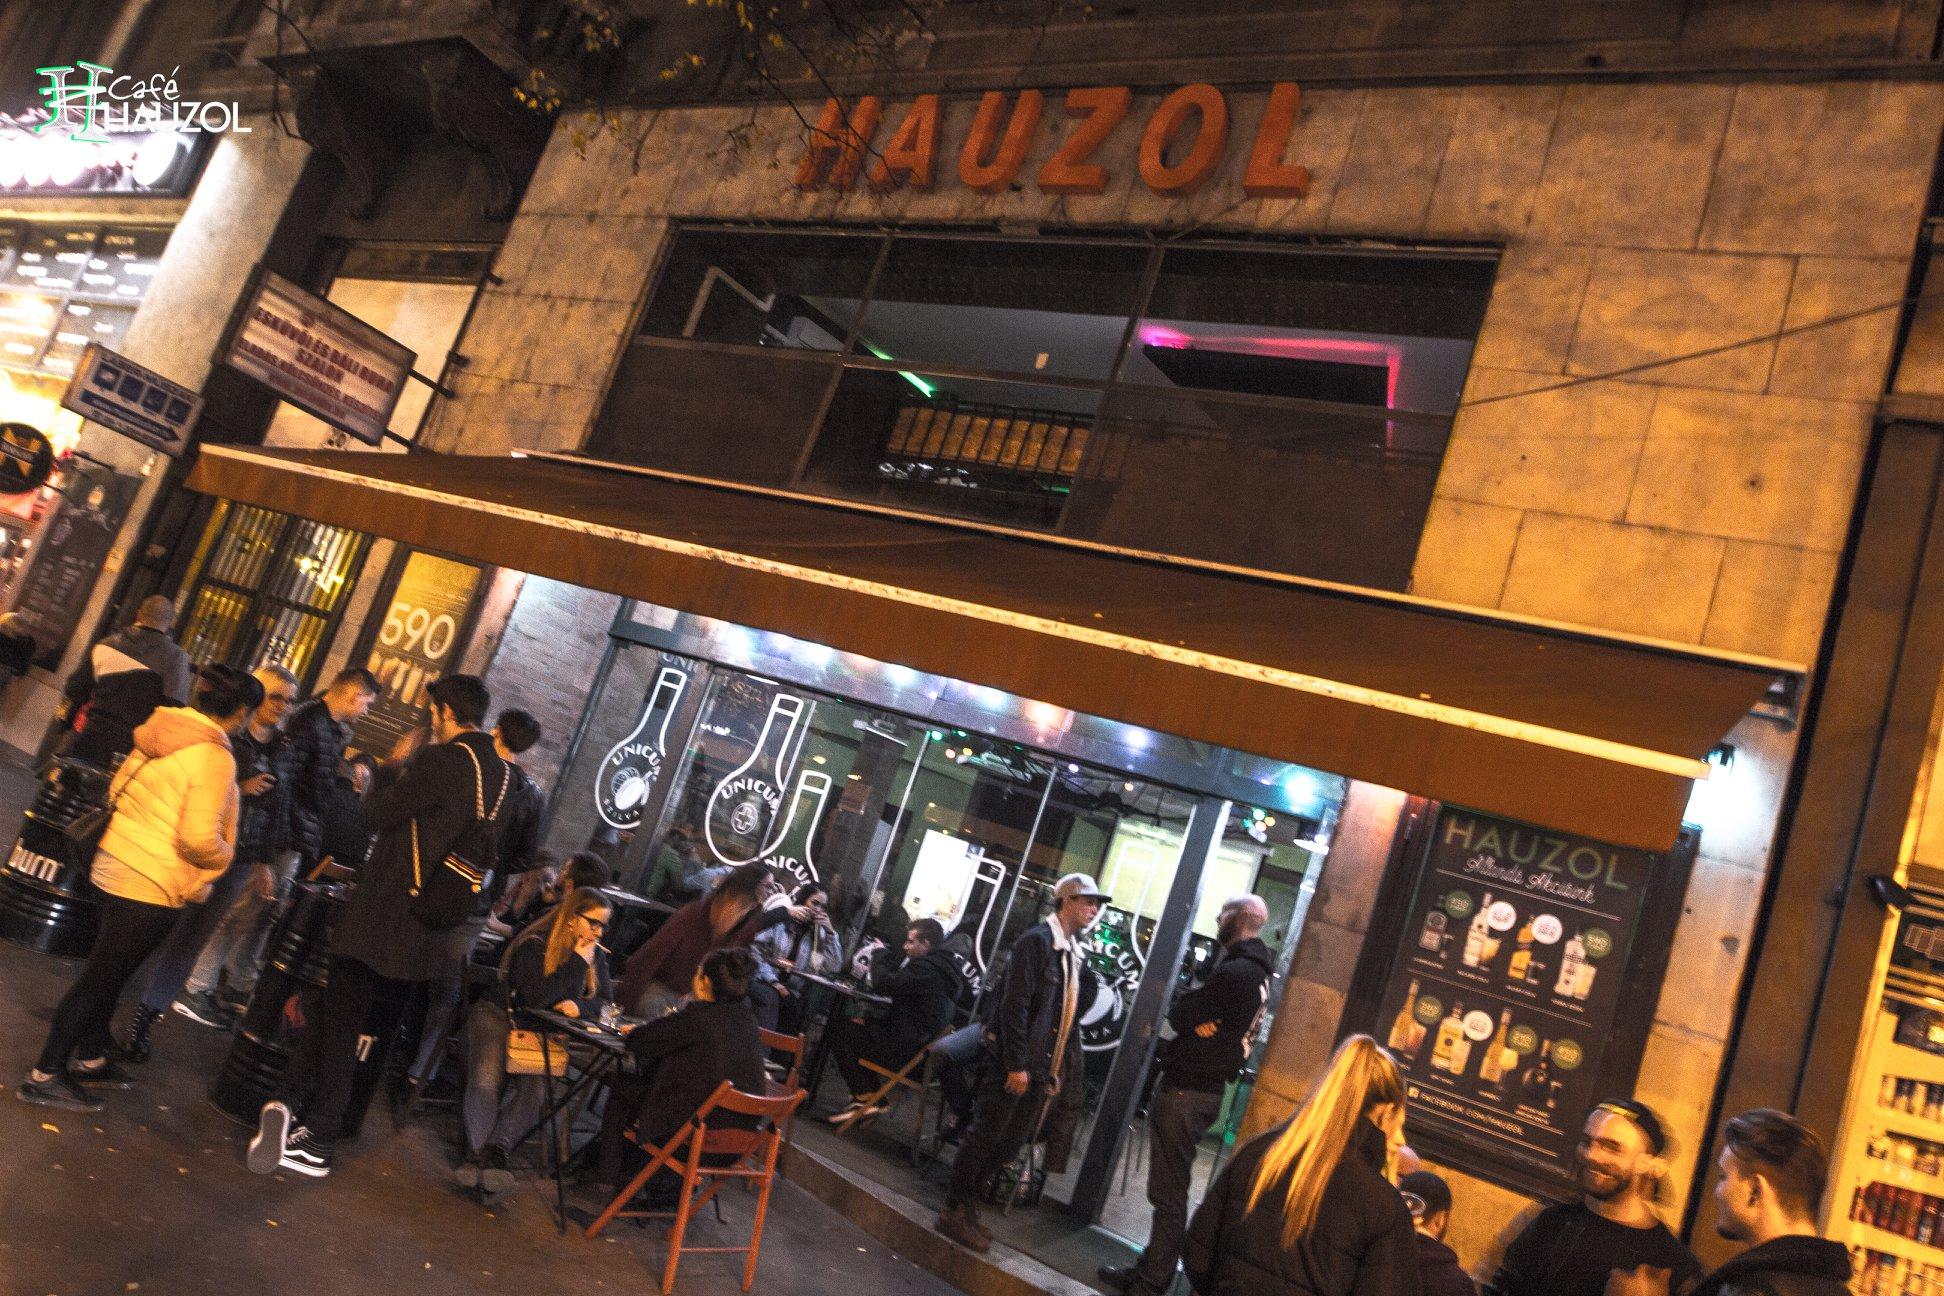 Hauzol Bar Budapest